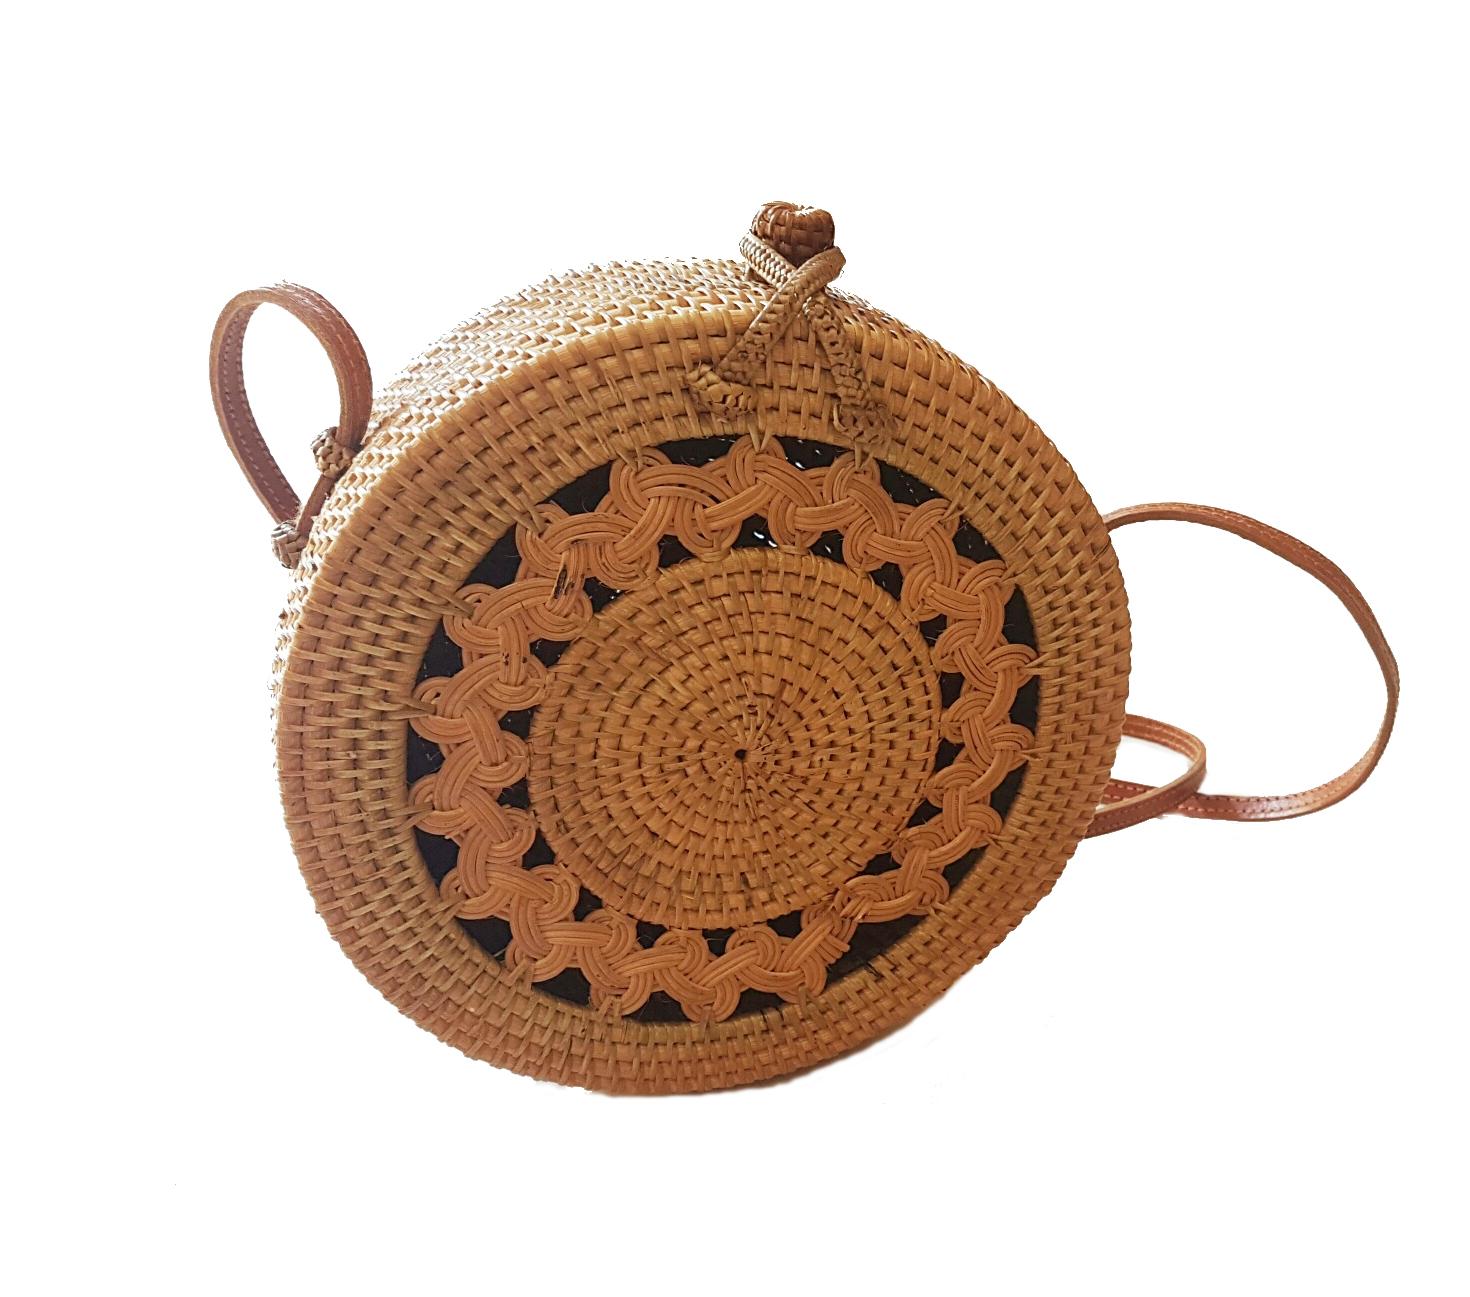 Rattan Nation - Classic Handwoven Rattan Bag (Honey Brown) on Storenvy 53ff02b4f09b7